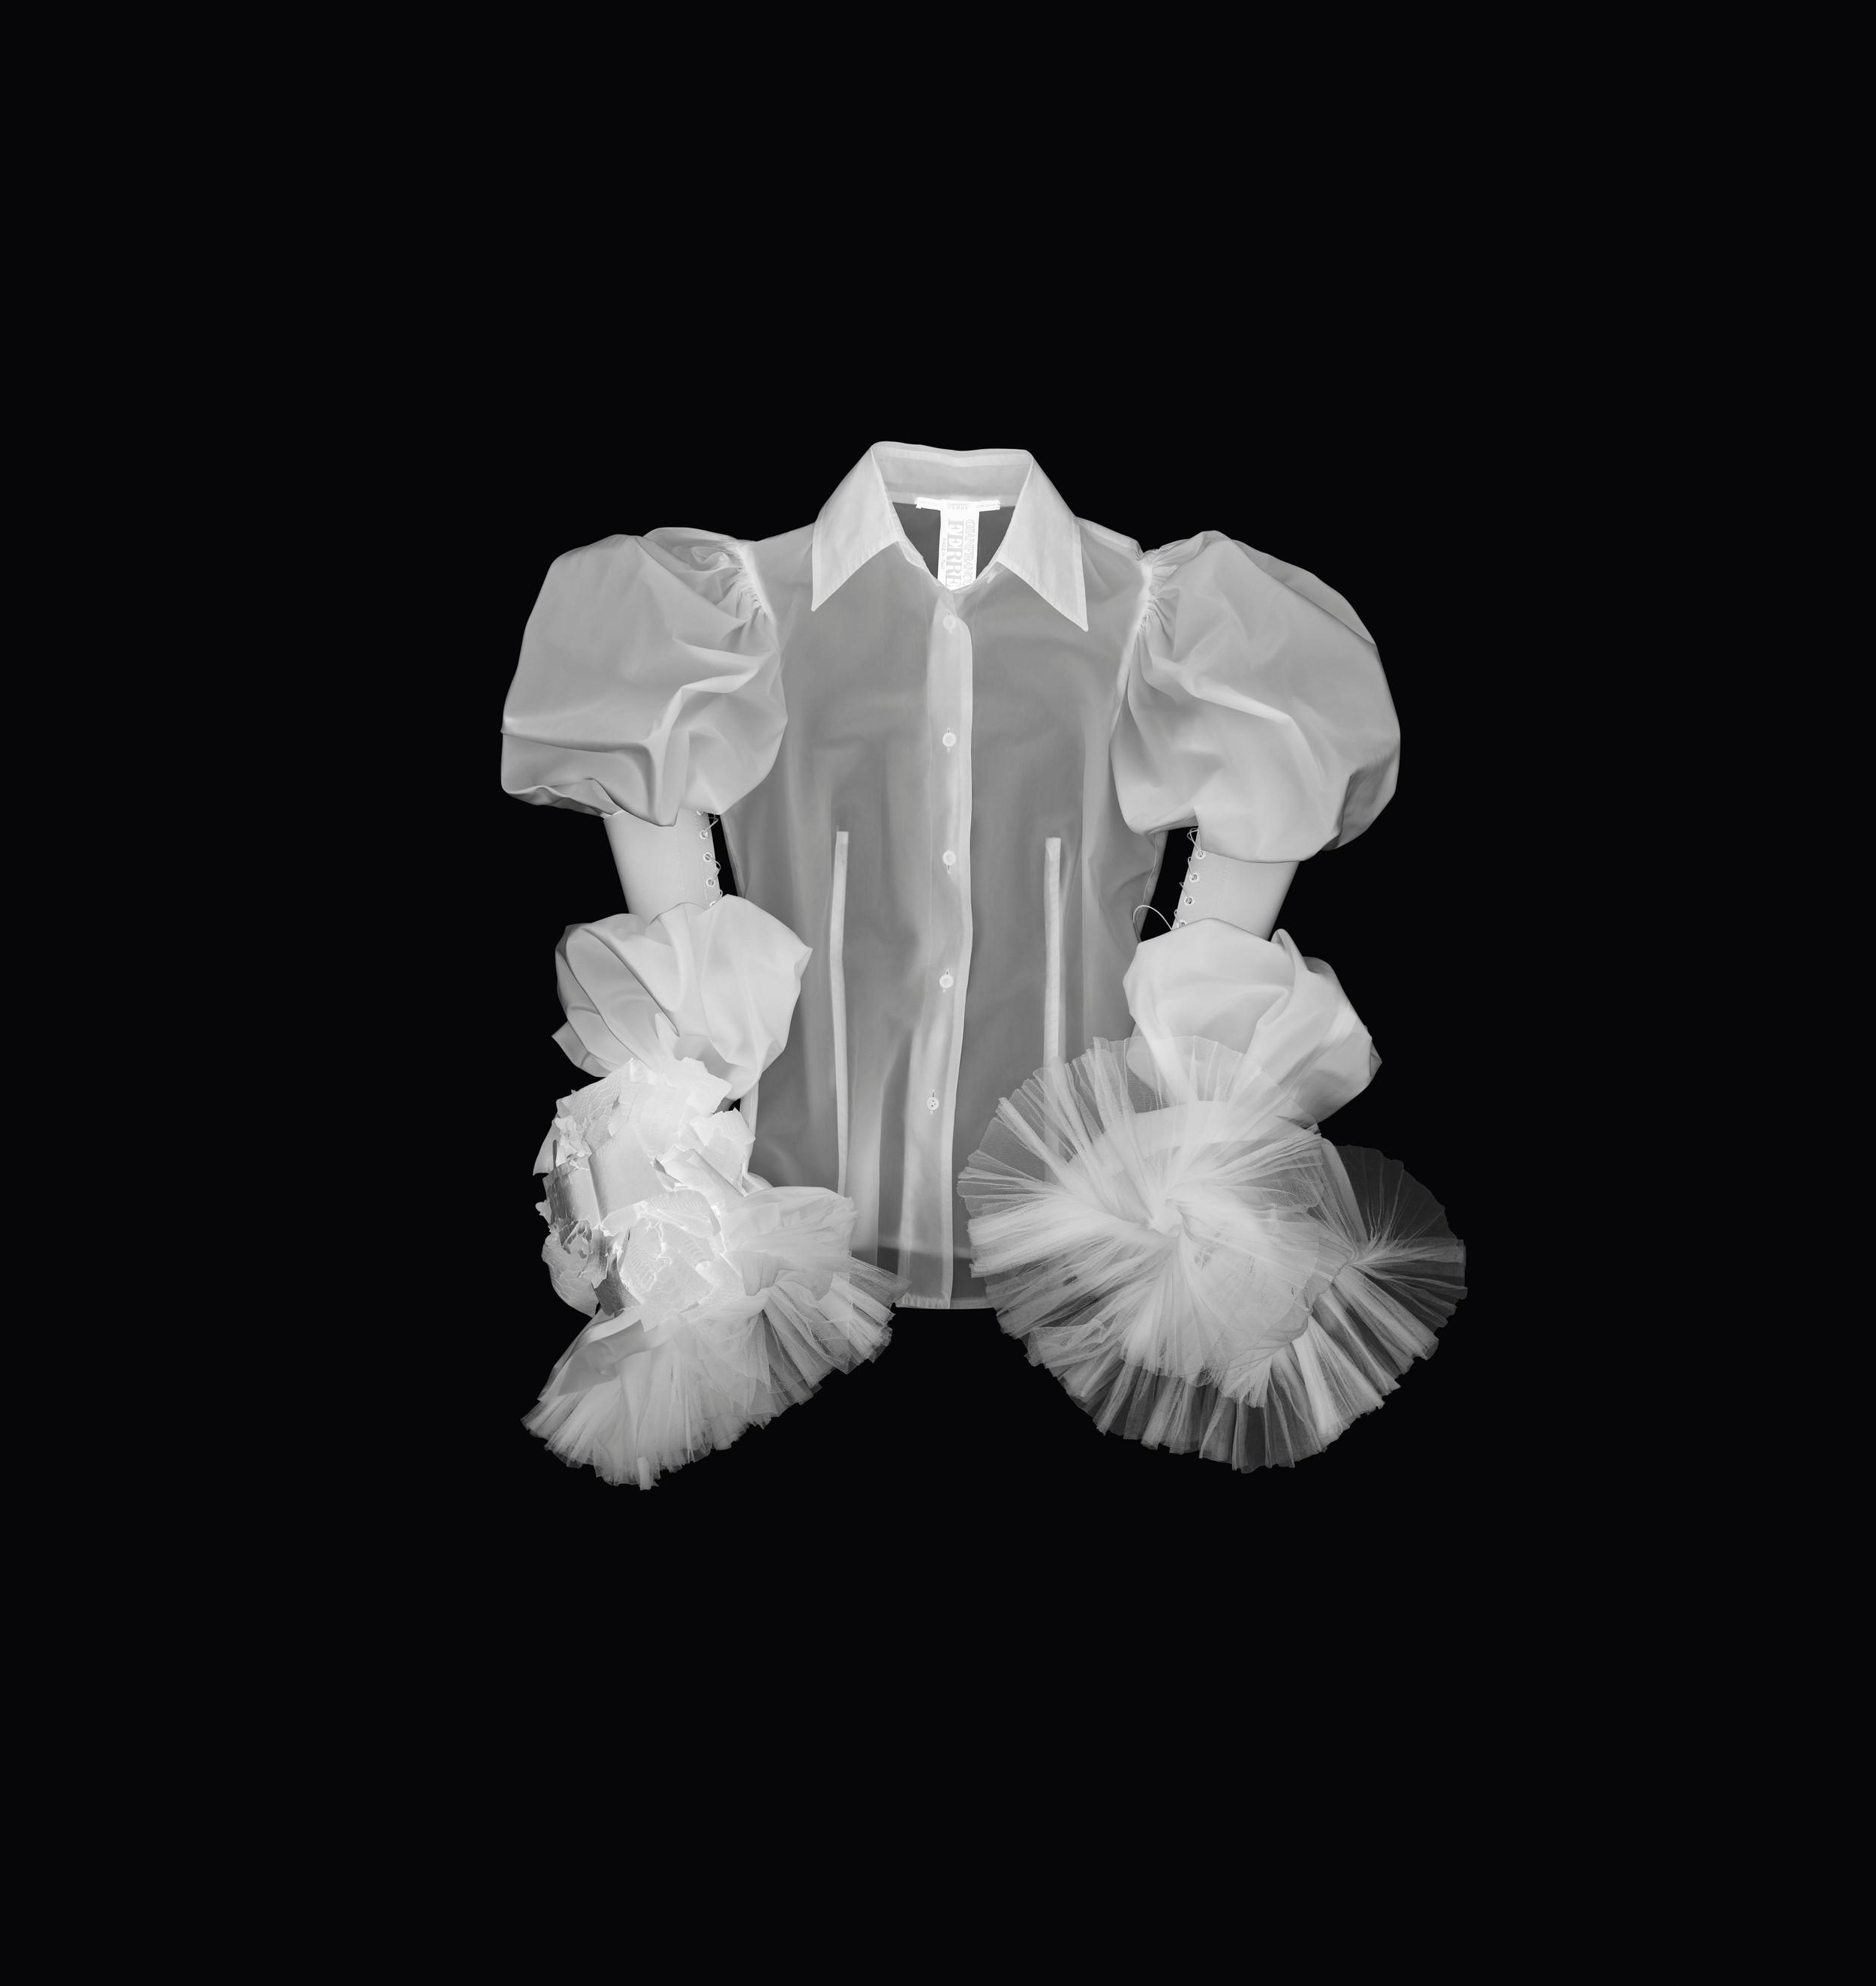 X-Ray simulation 'Orlando' shirt, Gianfranco Ferré Fall/Winter 2001 collection (Photography Leonardo Salvini)